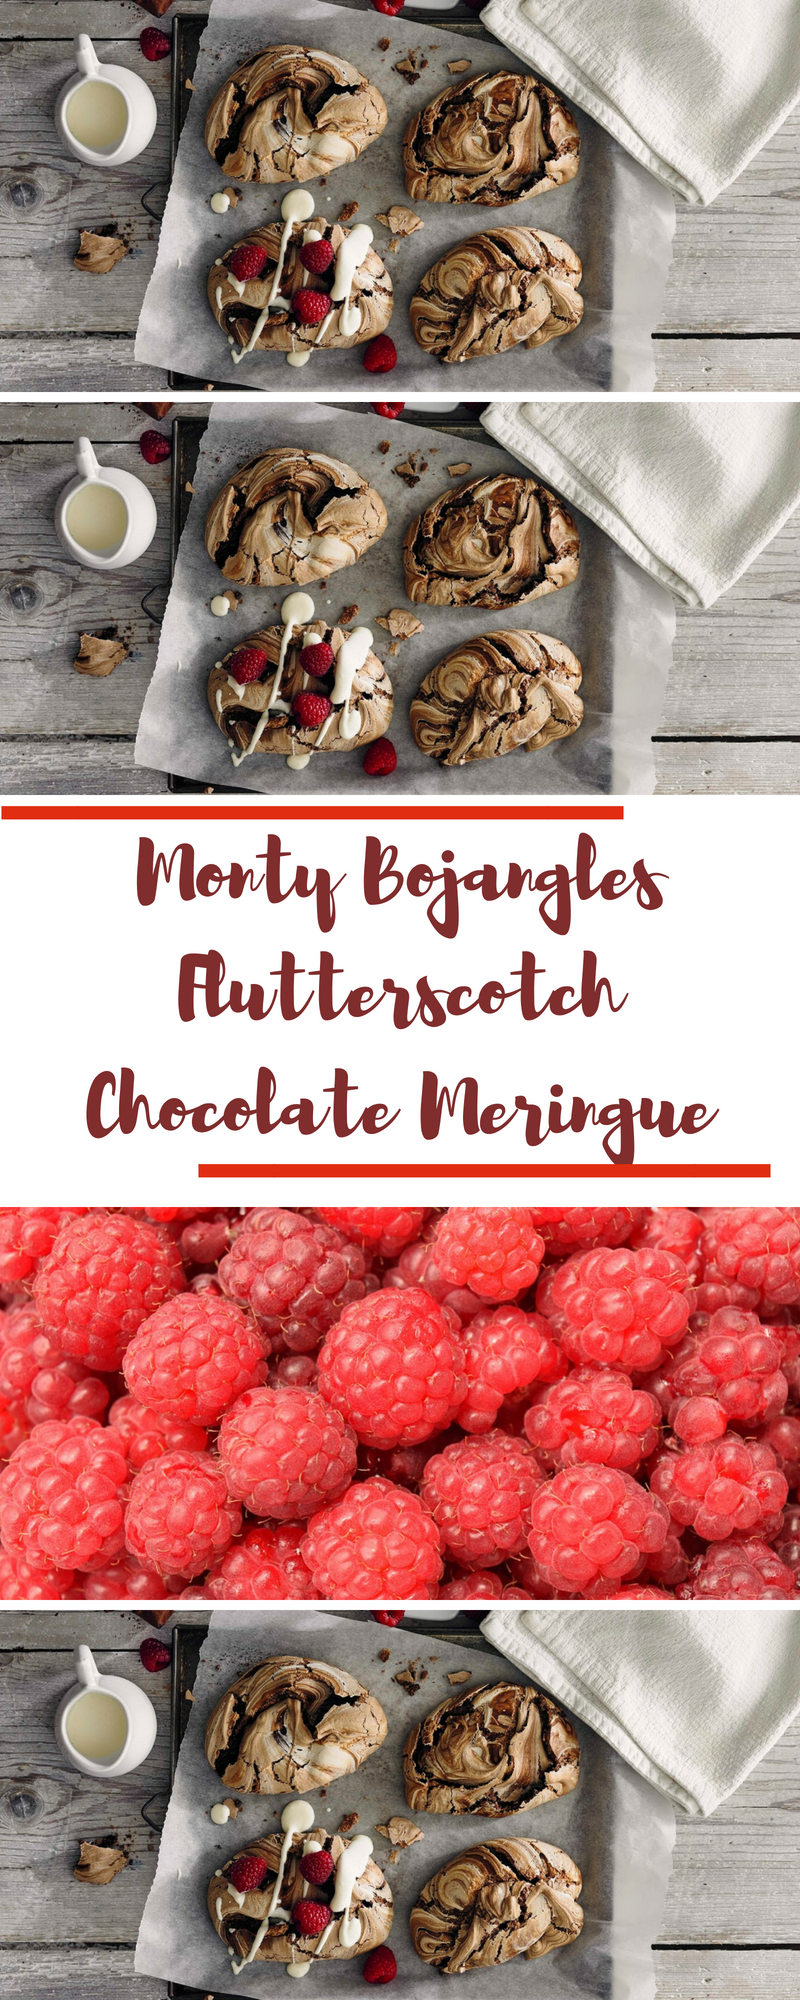 Monty Bojangles Flutterscotch Chocolate Meringue